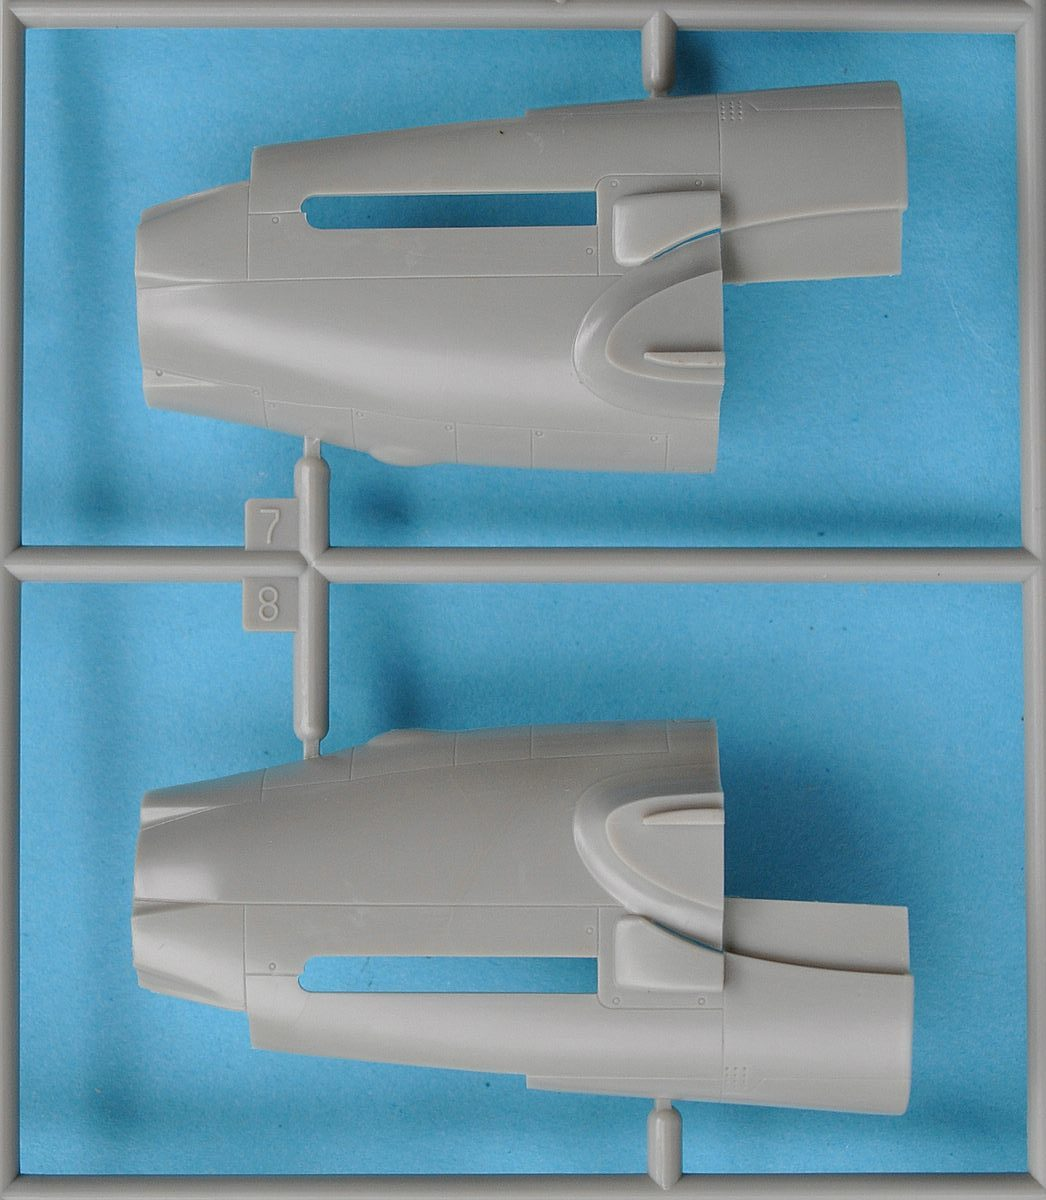 Revell-03932-Il-2-Stormovik-48 Iljuschin Il-2 in 1:48 von Revell (03932)